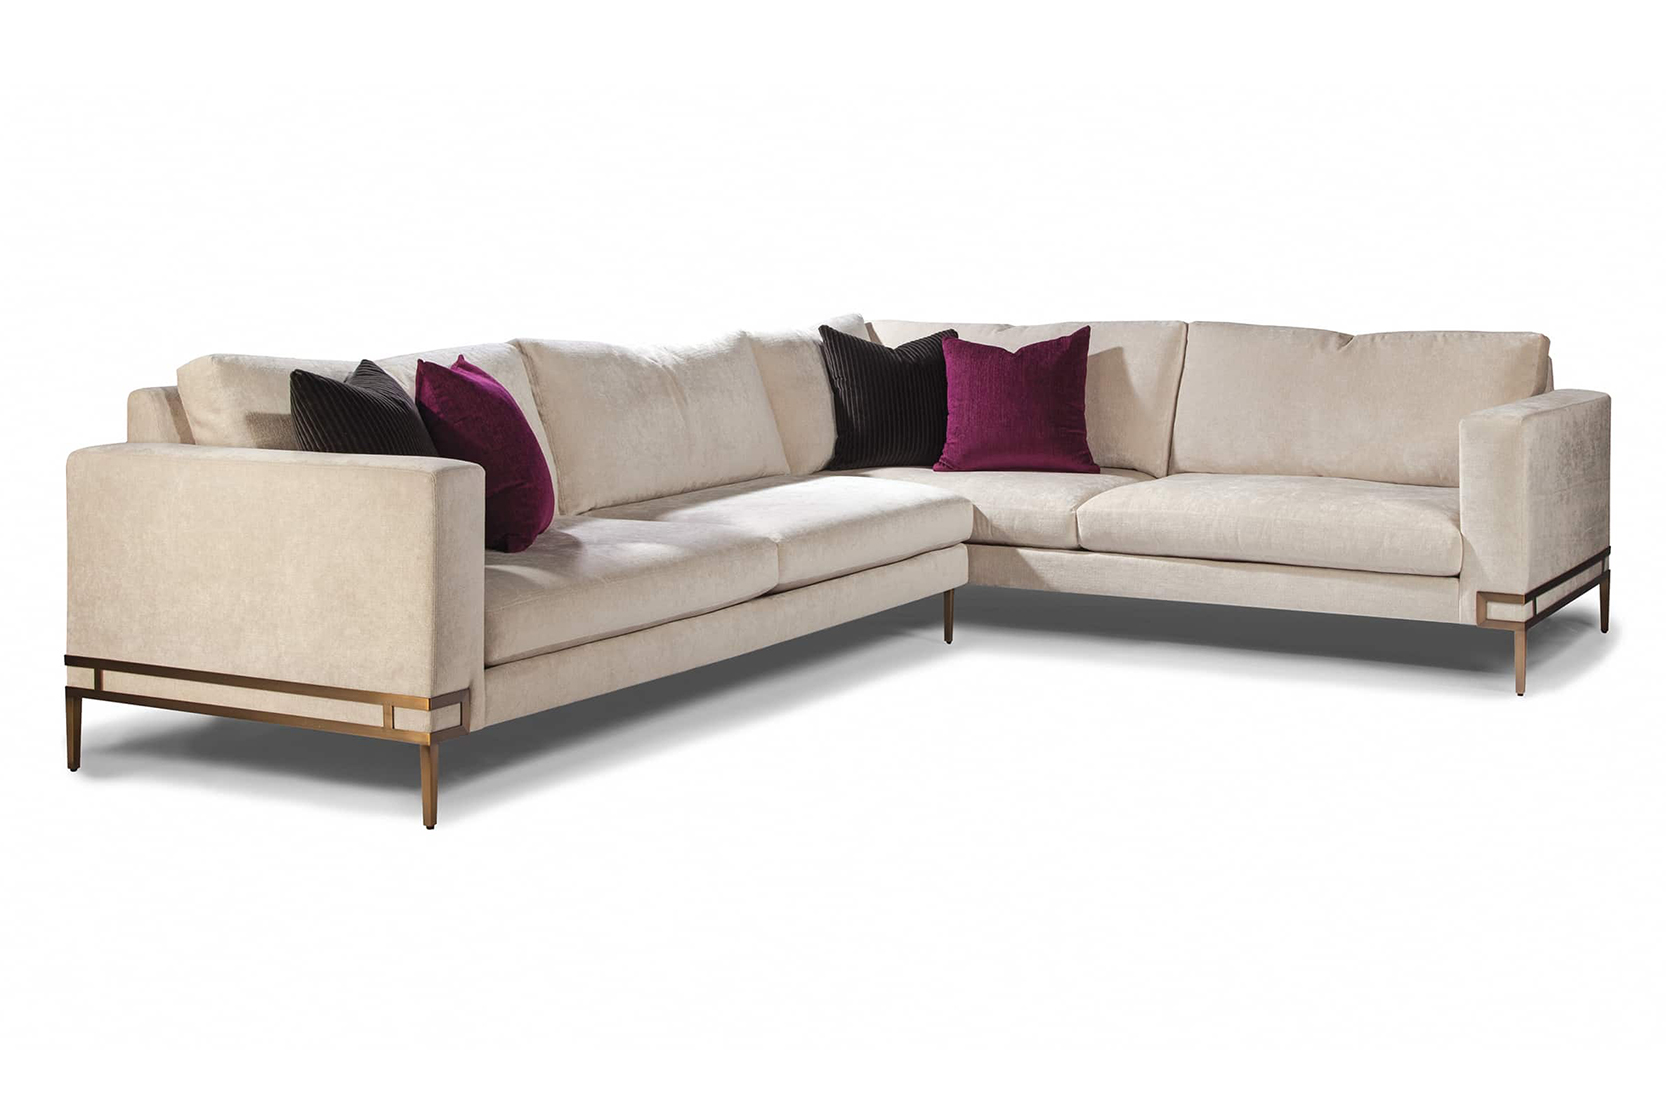 manolo sectional sofa